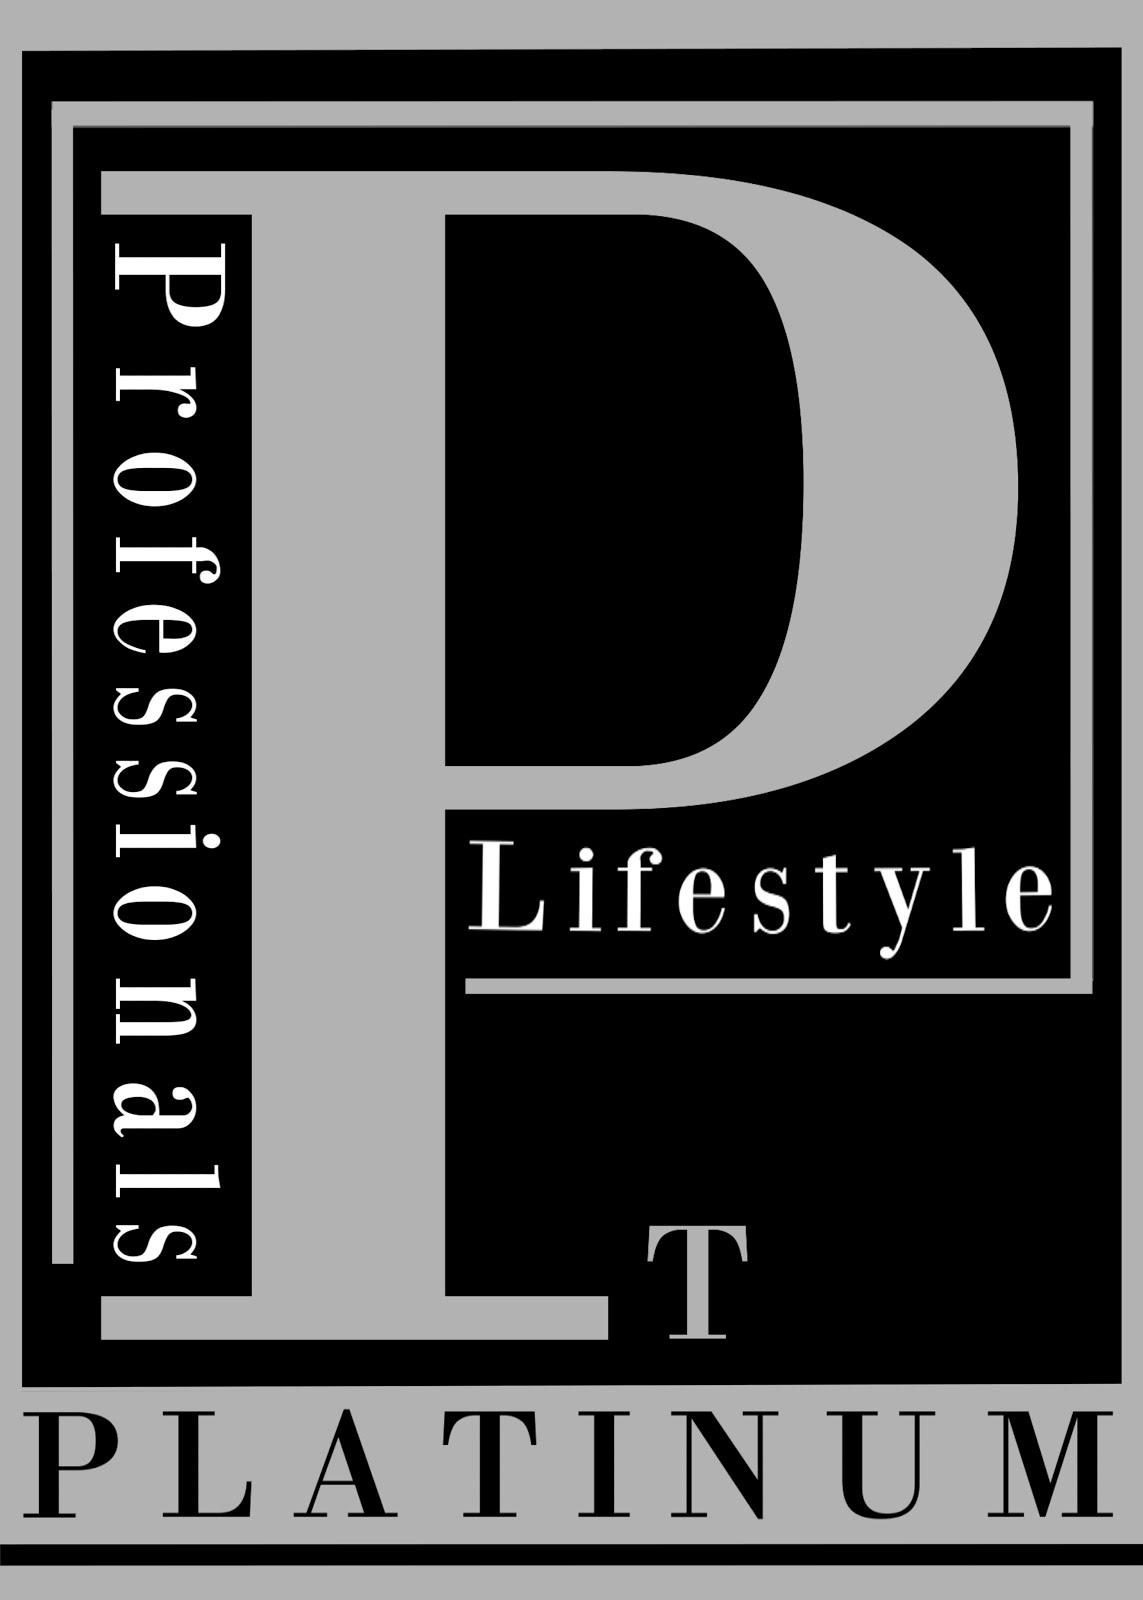 Dee's Platinum Website